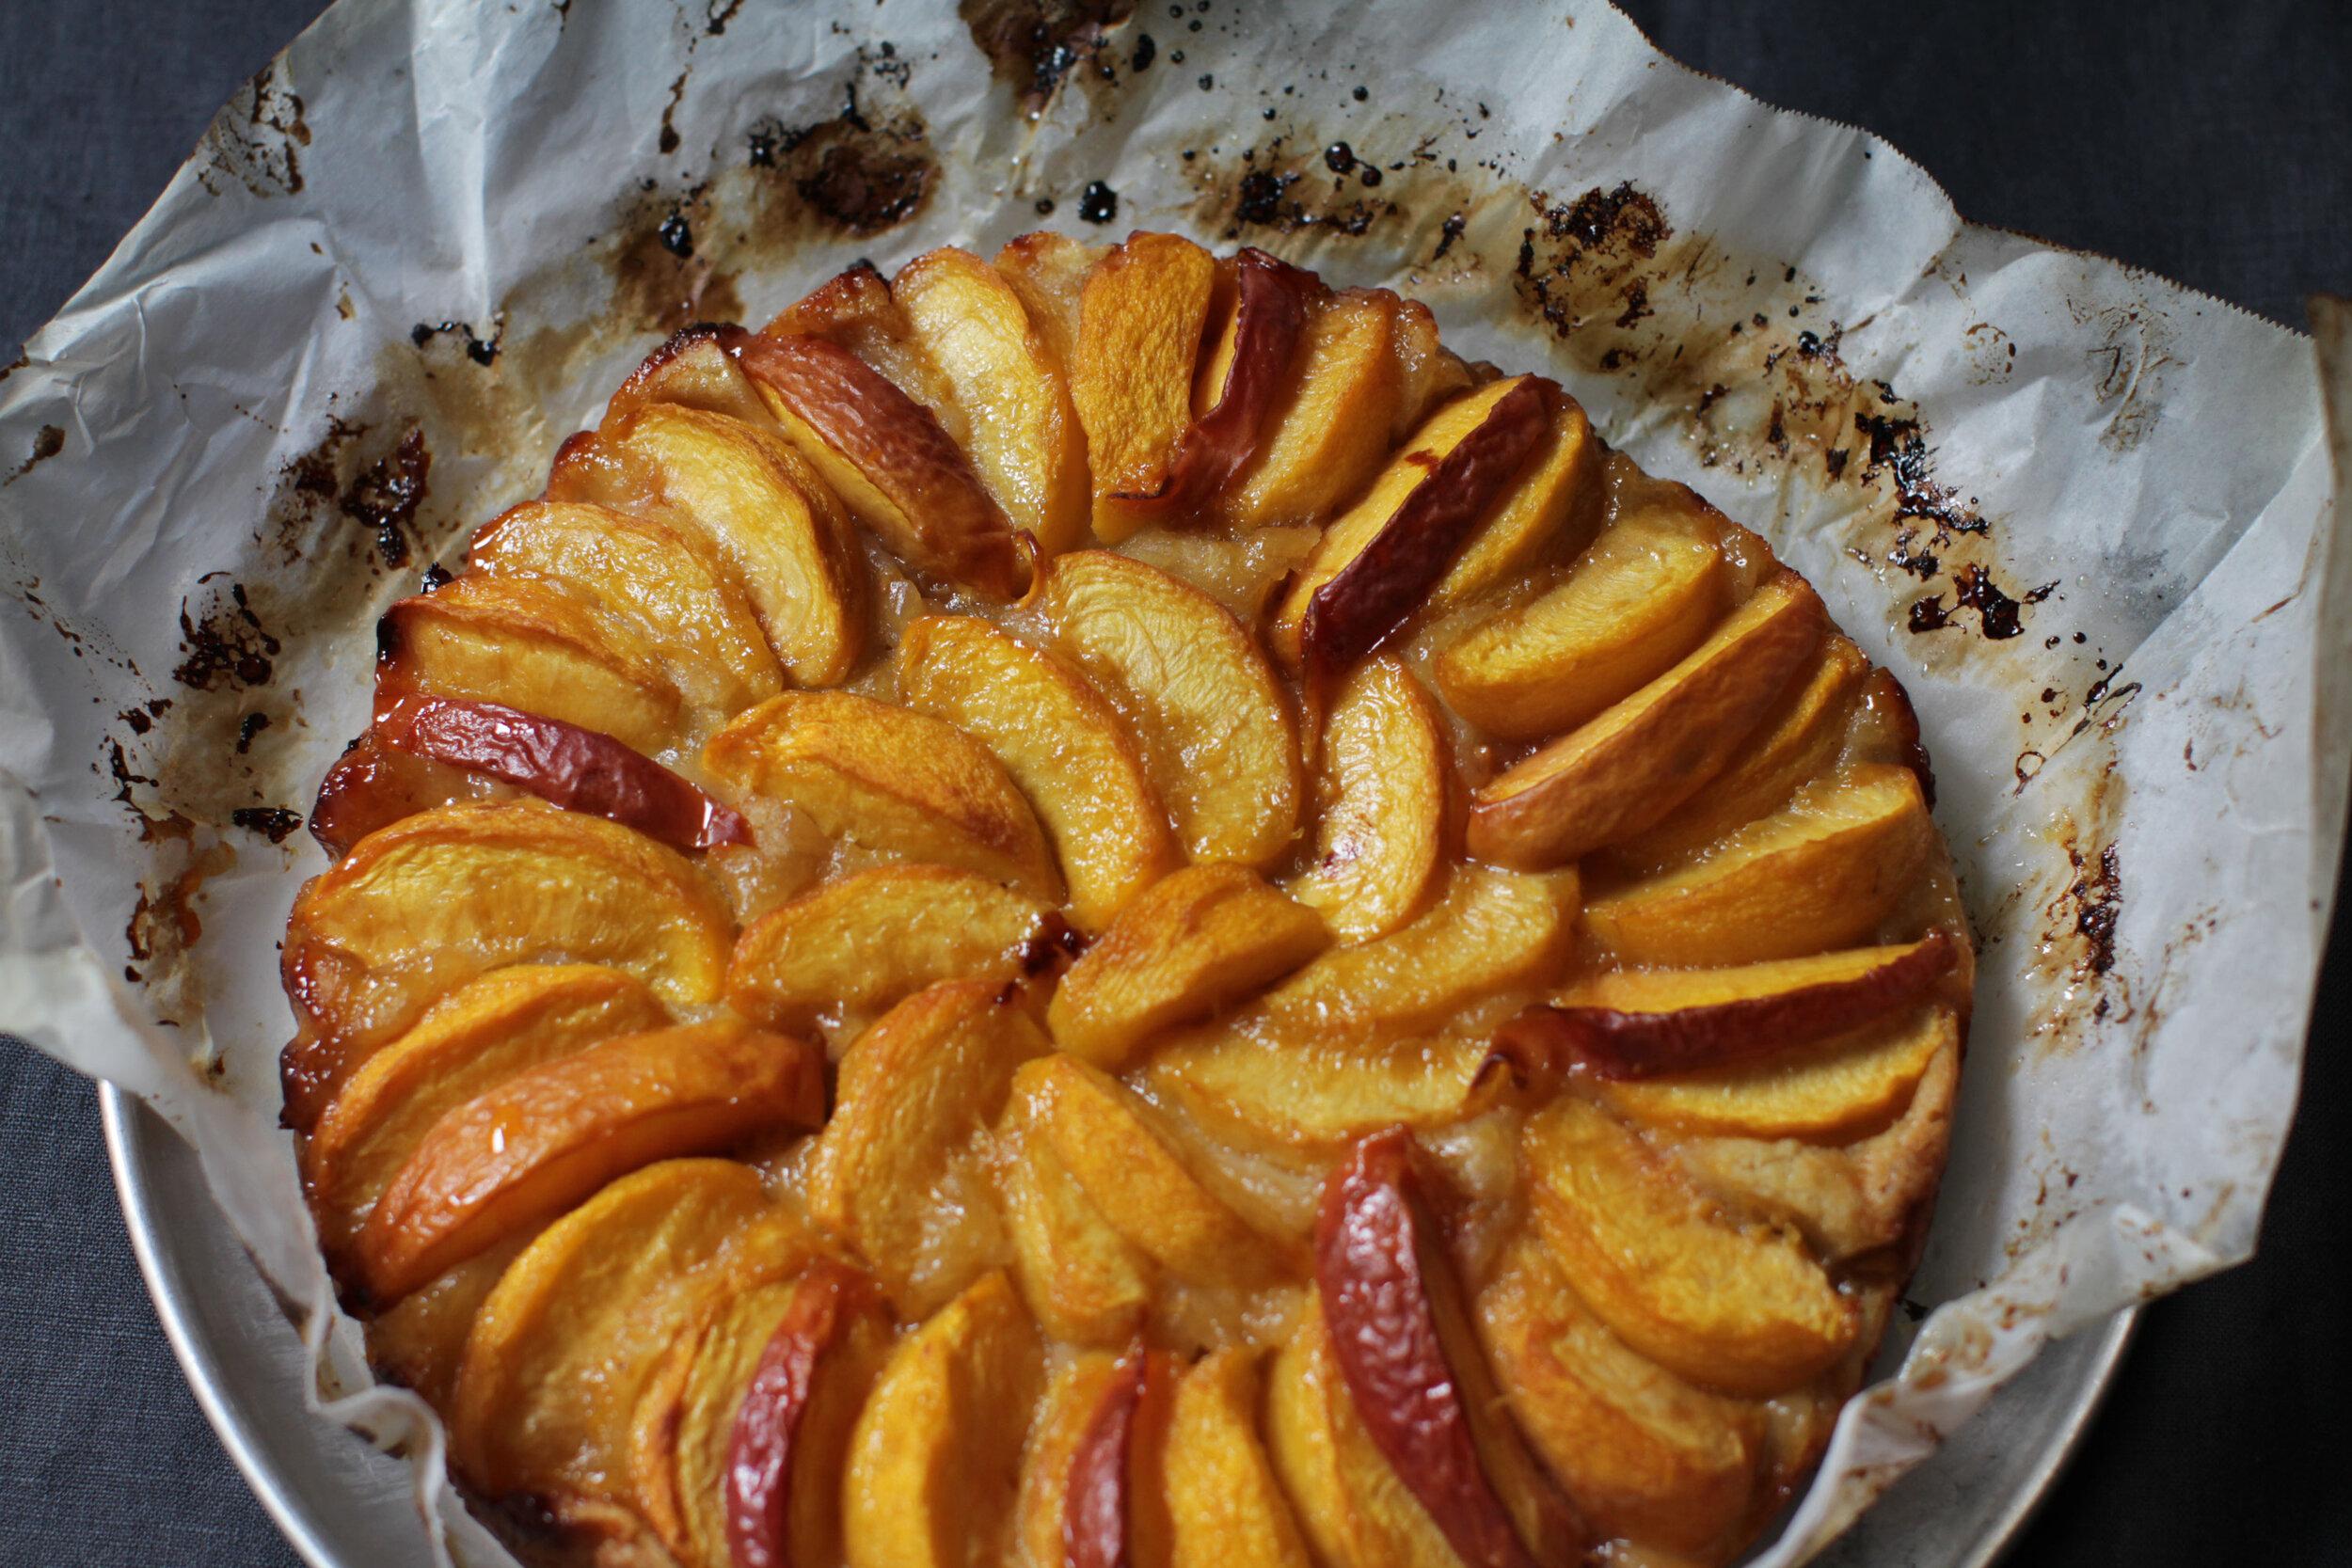 QC-autre-tarte-aux-peches-2.jpg